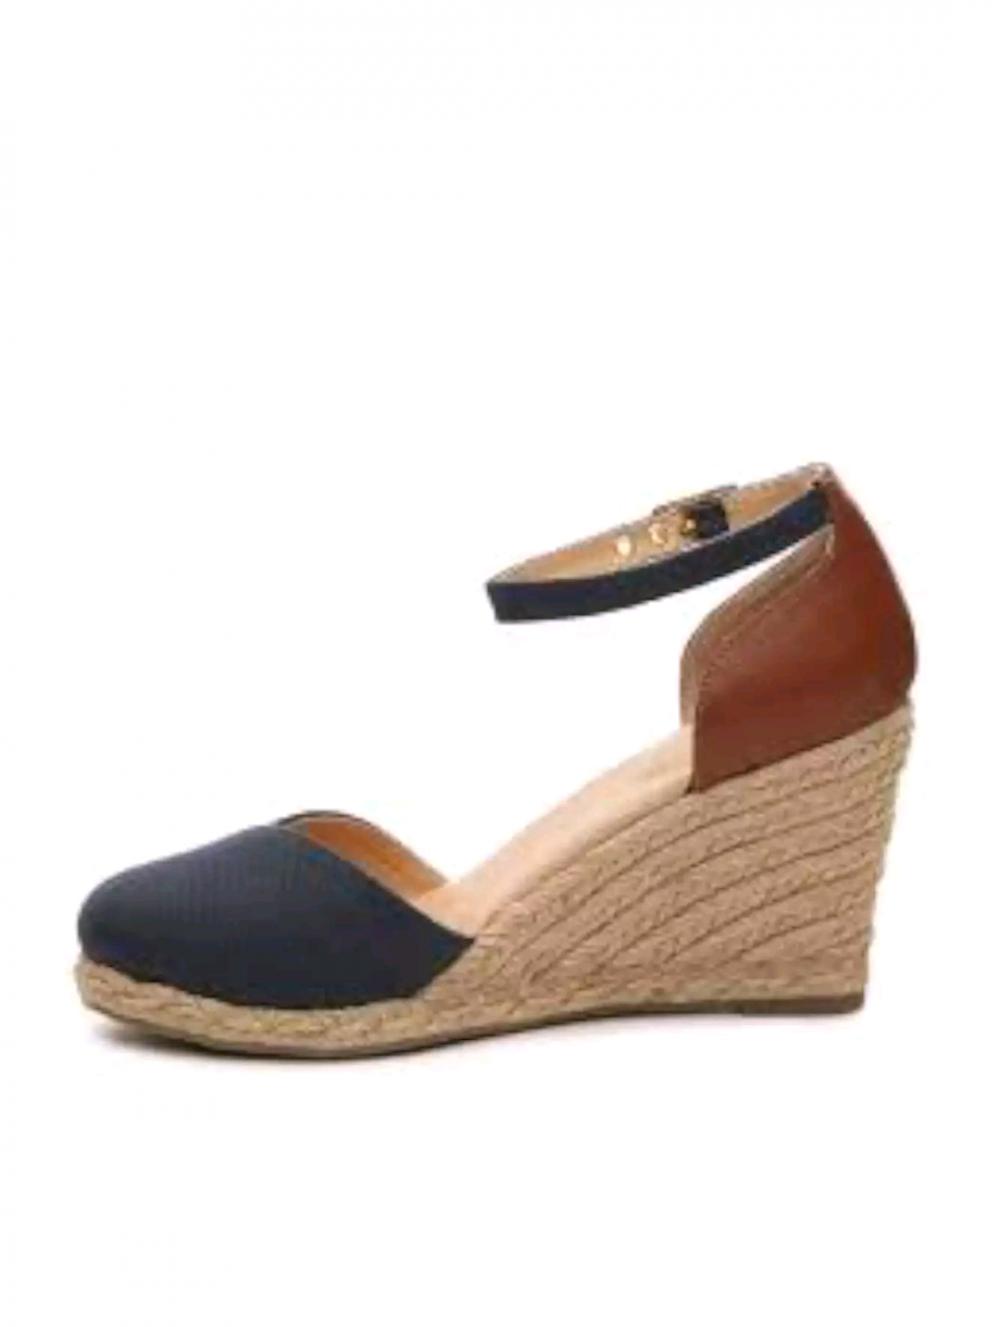 Туфли женские 38,5-39 (8M), Me Too